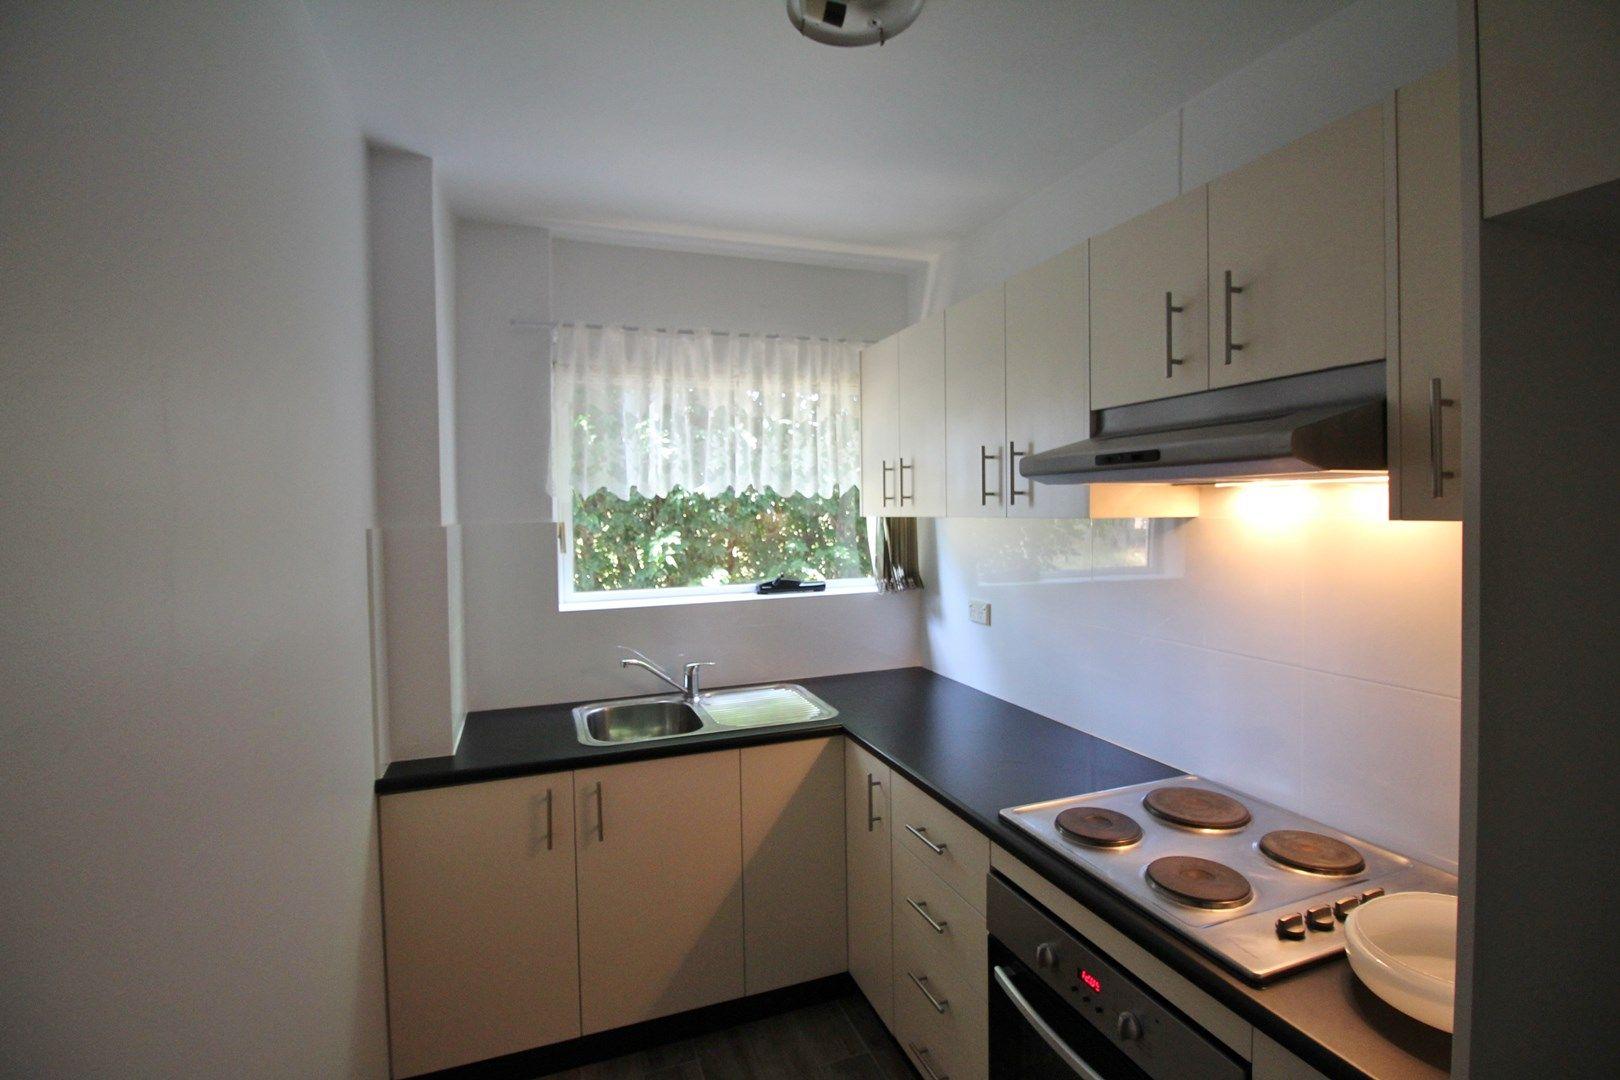 1K/15 Campbell Street, Parramatta NSW 2150, Image 0